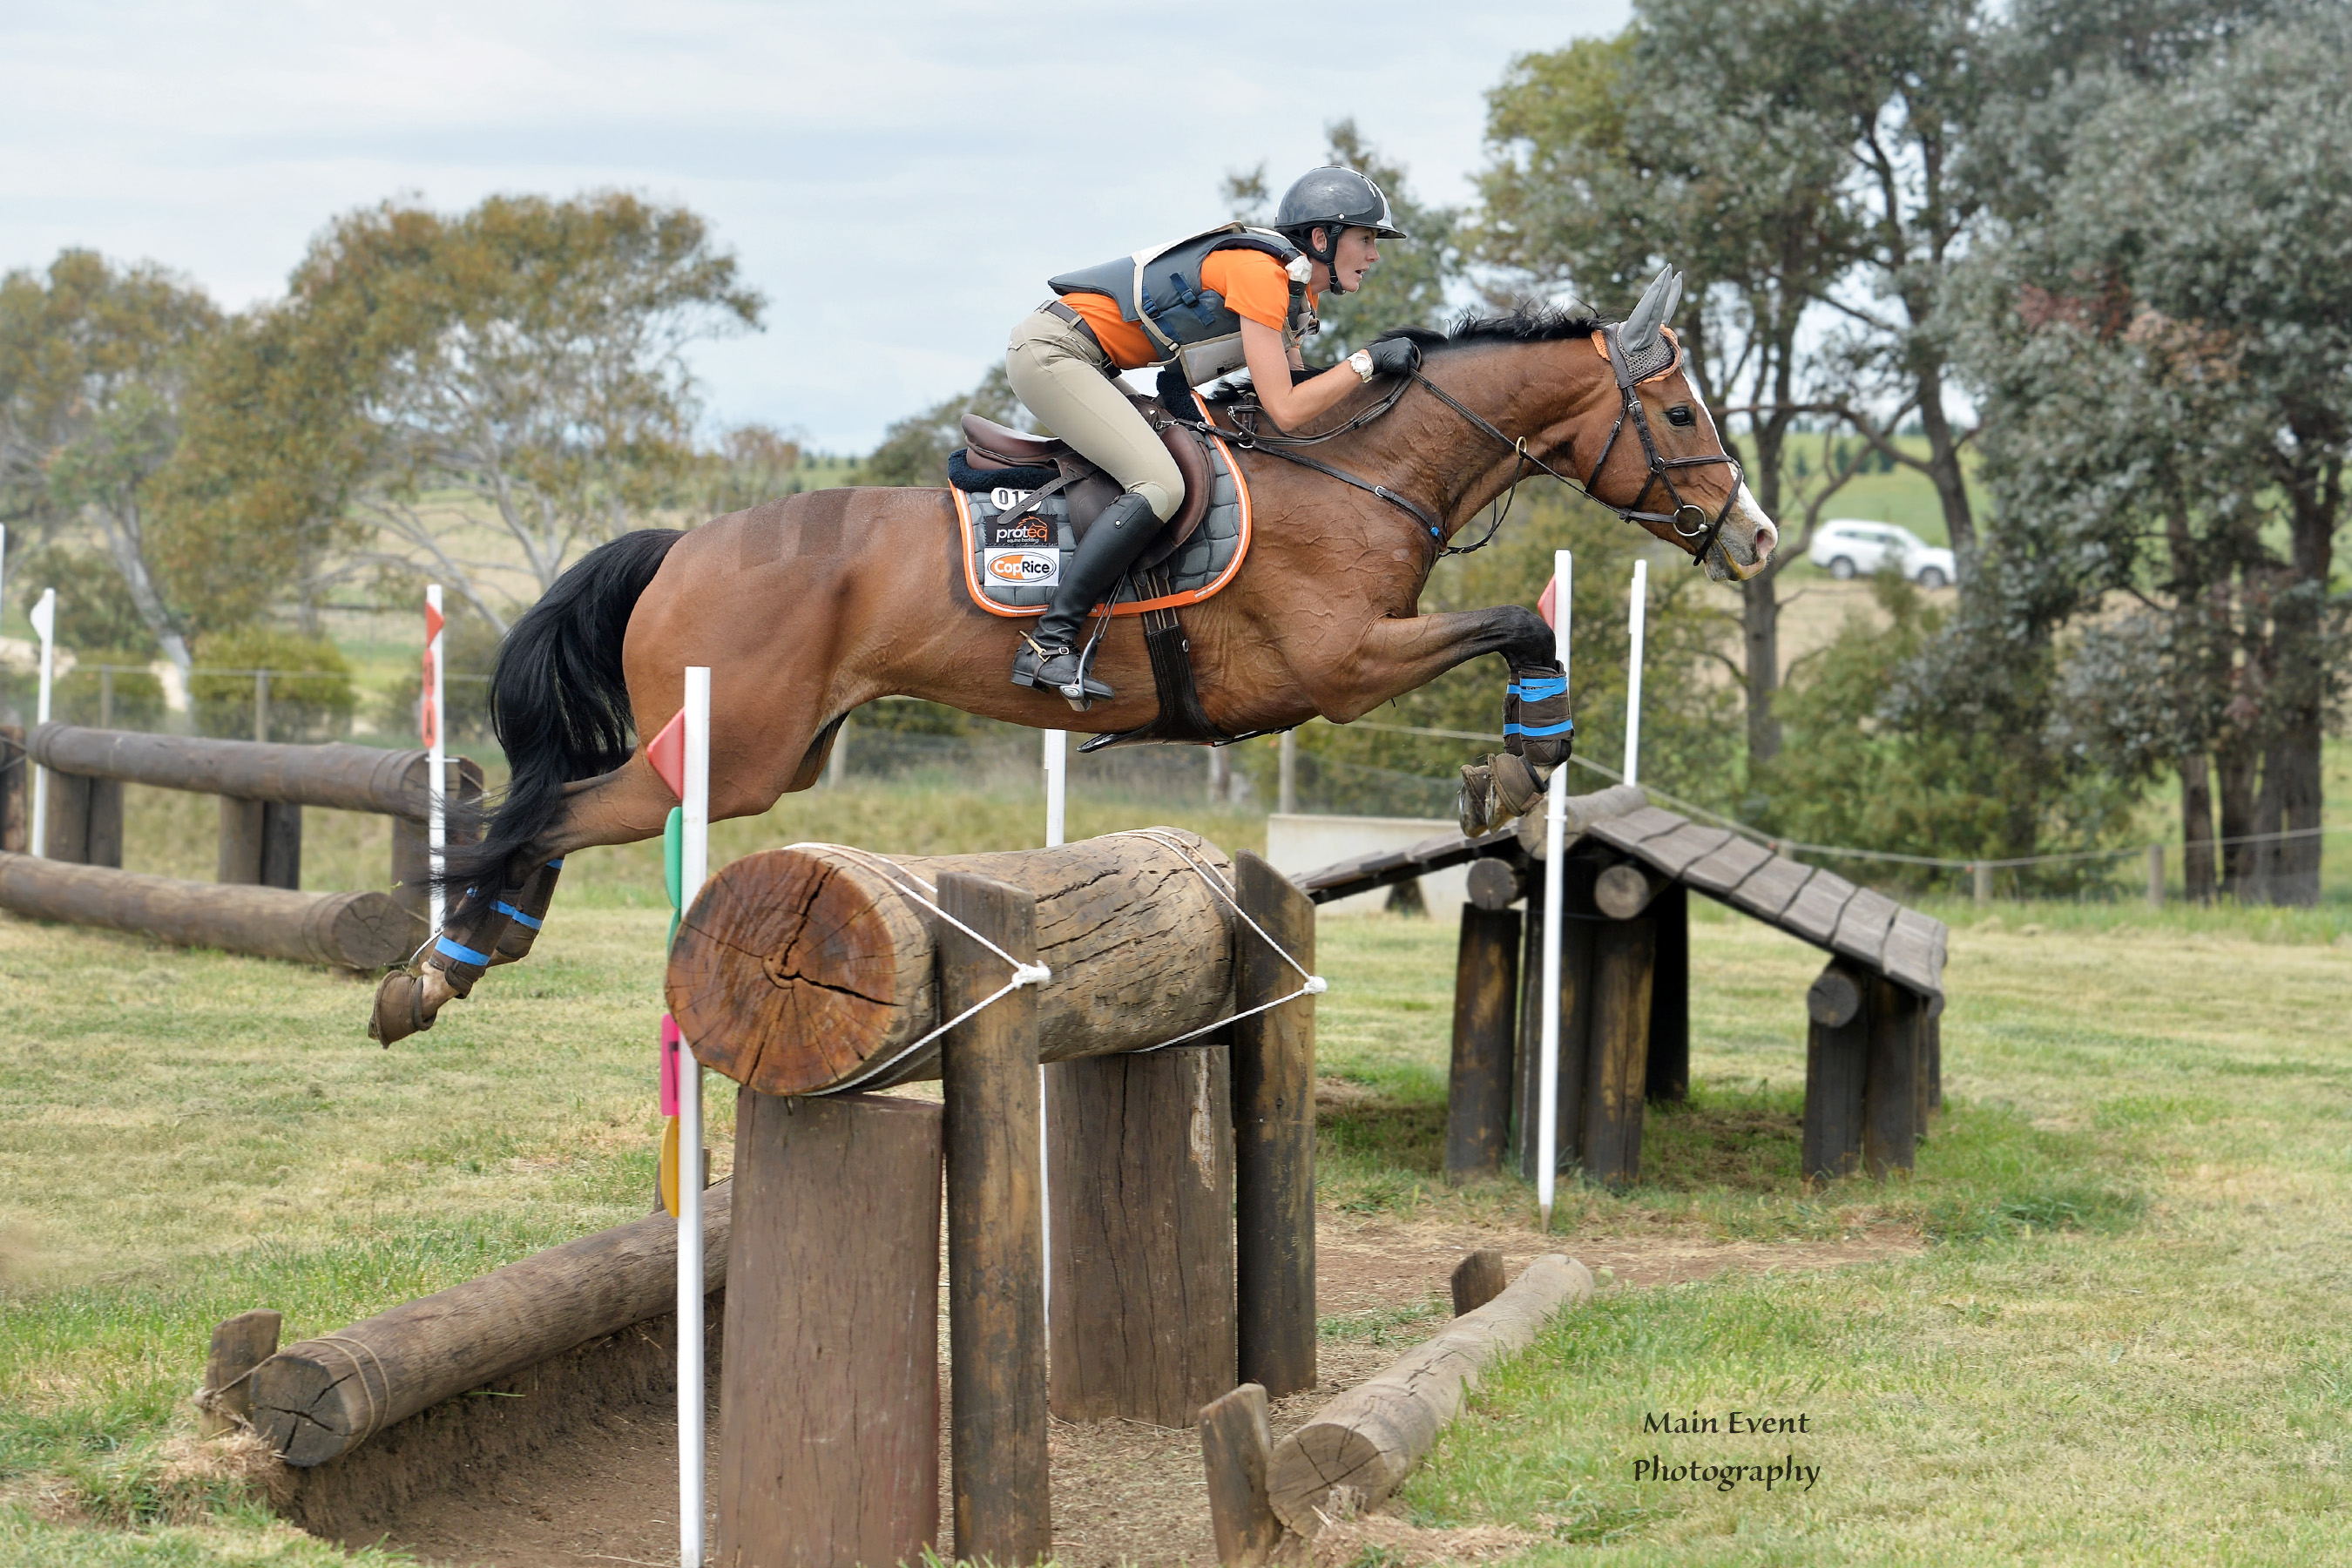 Mattea Davidson – Davidson Equestrian